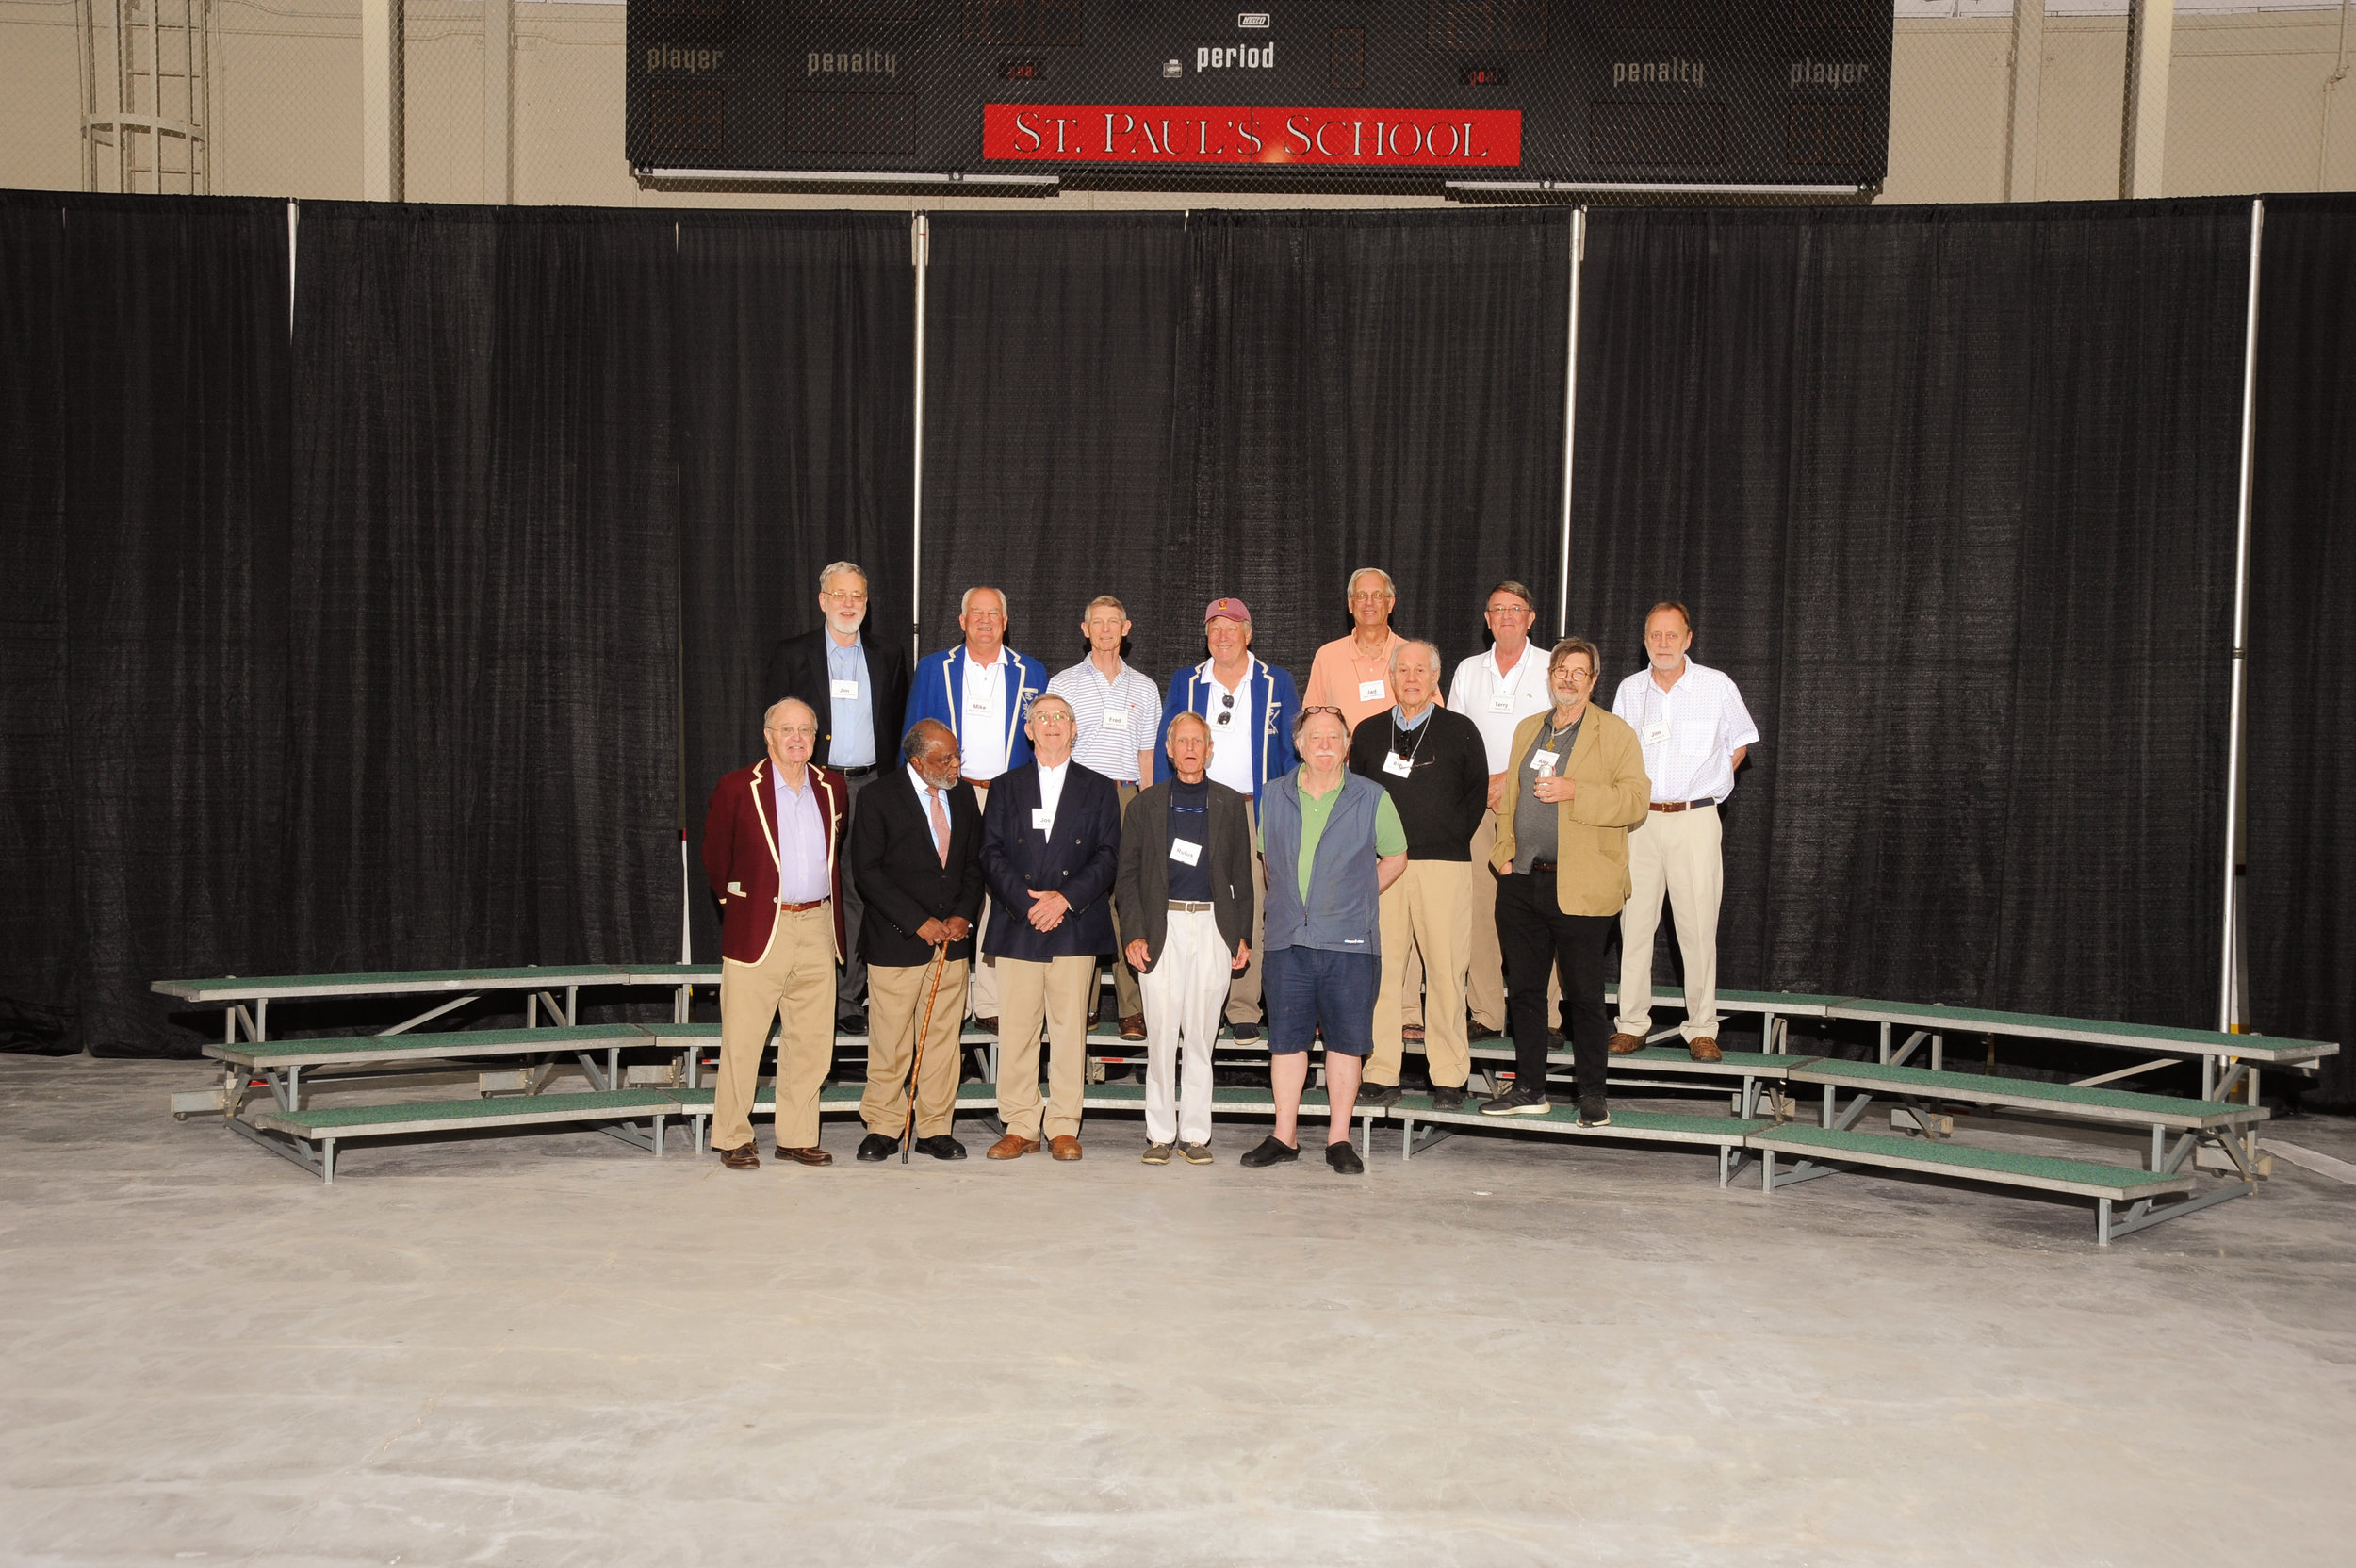 (L. to r.) row 1: Peter Gerry, Ted Landsmark, Jos Wiley, Rufus Botzow, Jim Cummins, Rob Claflin, Alex Shoumatoff; row 2: Jim Goodwin, Mike Howard, Fred Morris, Rick Sperry, Jad Roberts, Terry Lichty, and Jim Schutze.